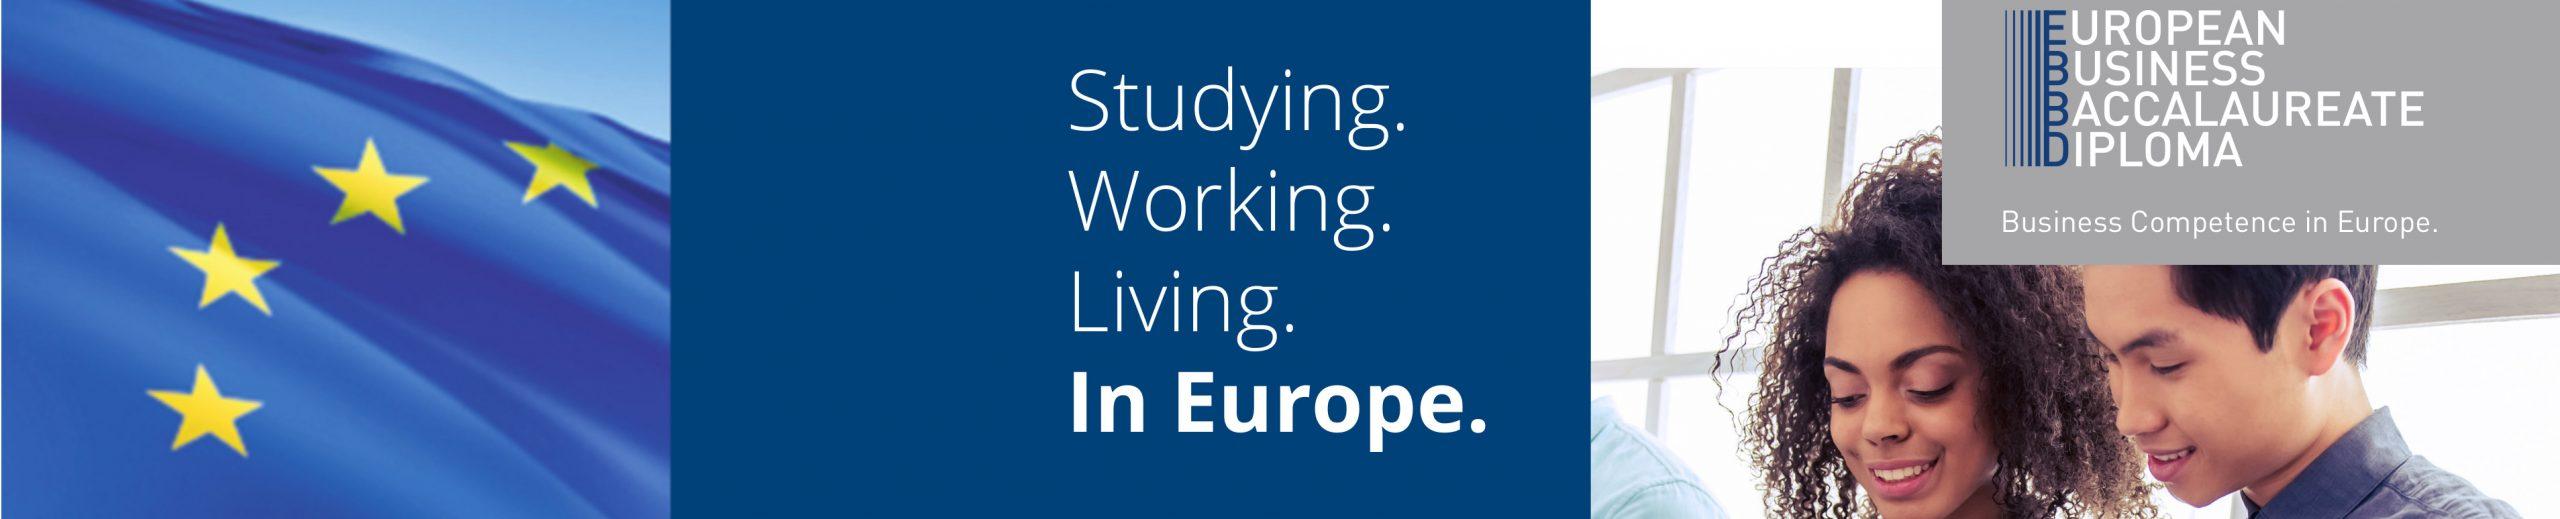 European Business Baccalaureate Diploma